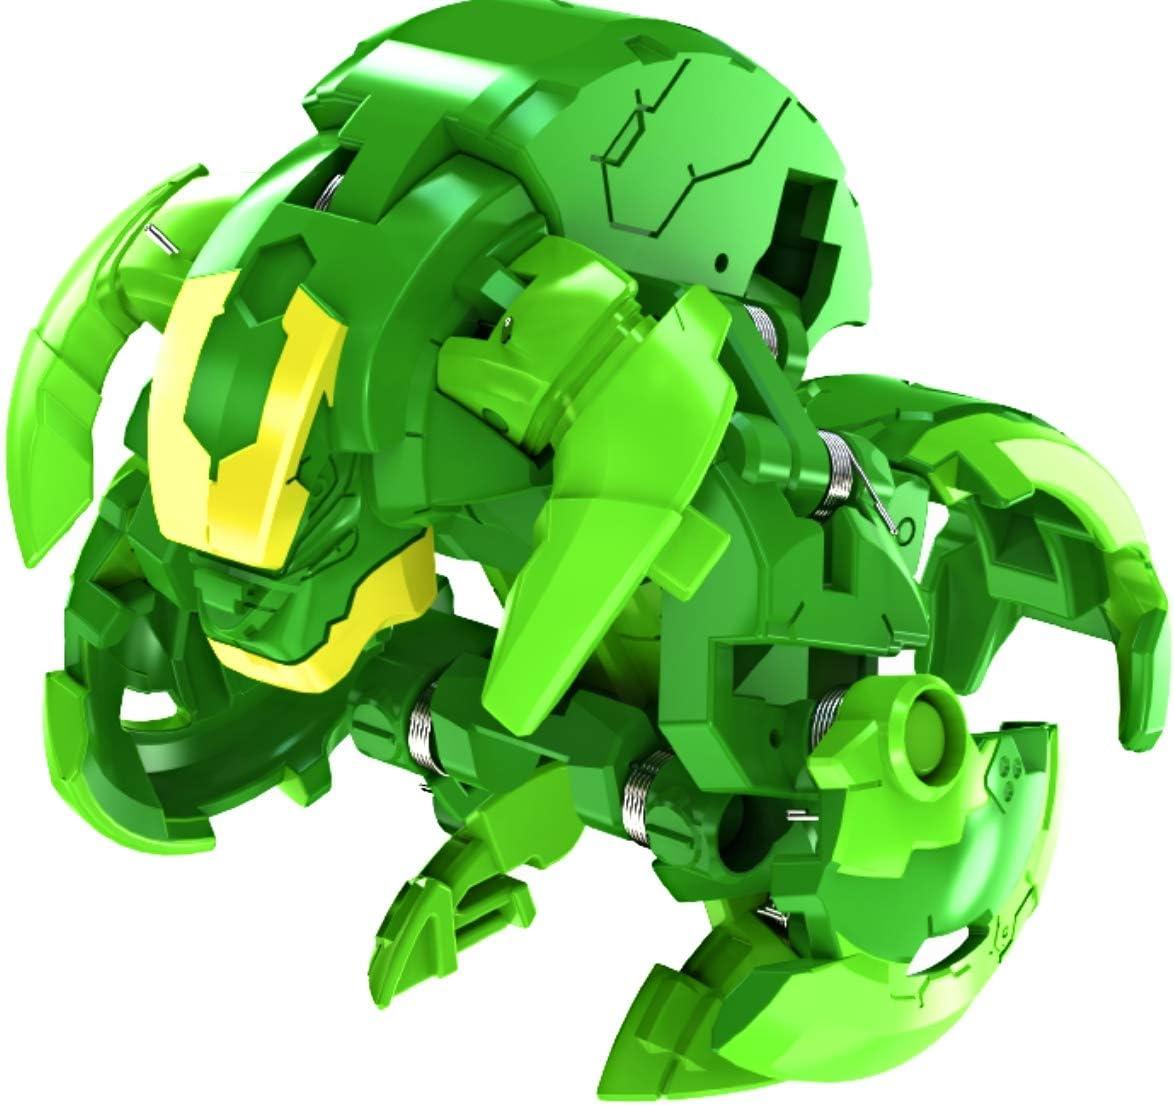 "Bakugan, Ventus Ninja, 2"" Tall Collectible Transforming Creature, for Ages 6 & Up"